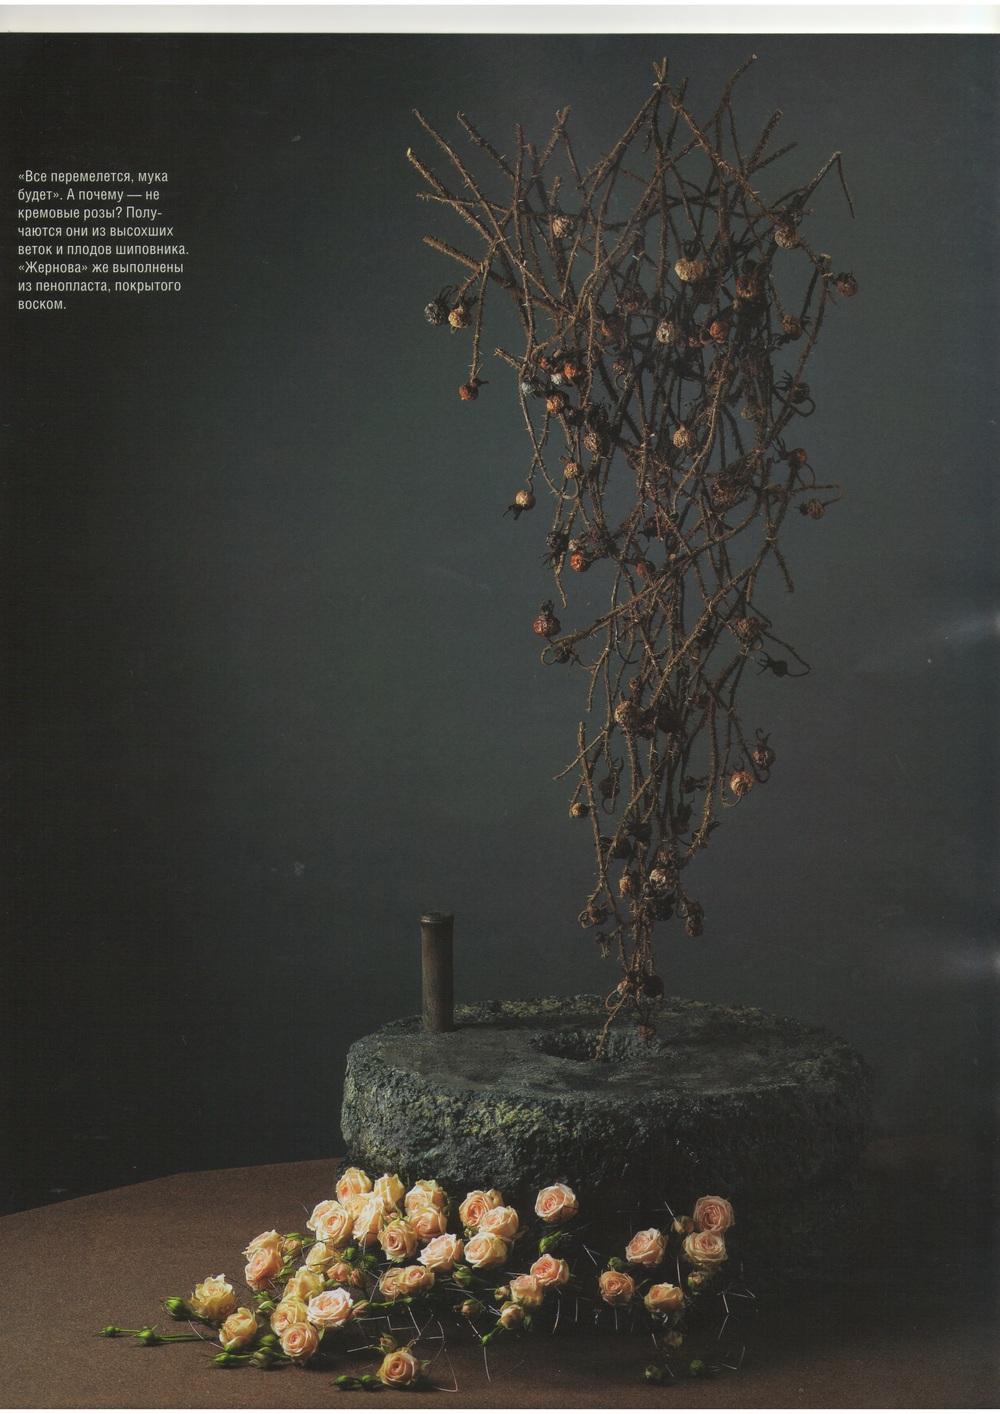 журнал цв 08-2010-4.jpg